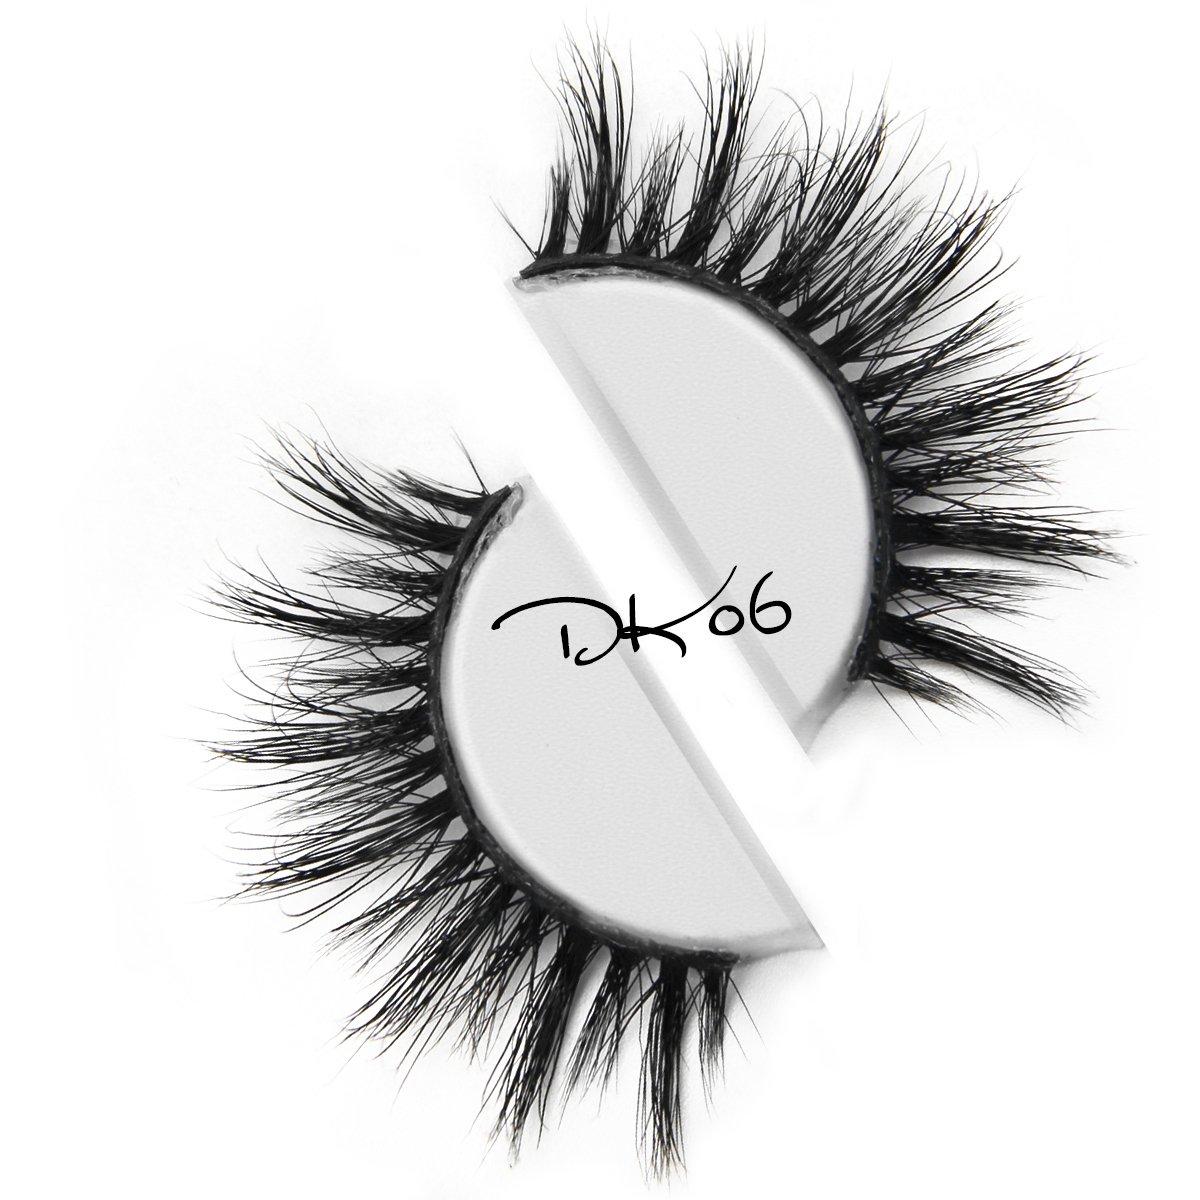 3D Mink Fur False Eyelashes Handmade Natural Lashes Women's Makeup Beauty Fake Lashes 1 Pair Per Package(DK06)